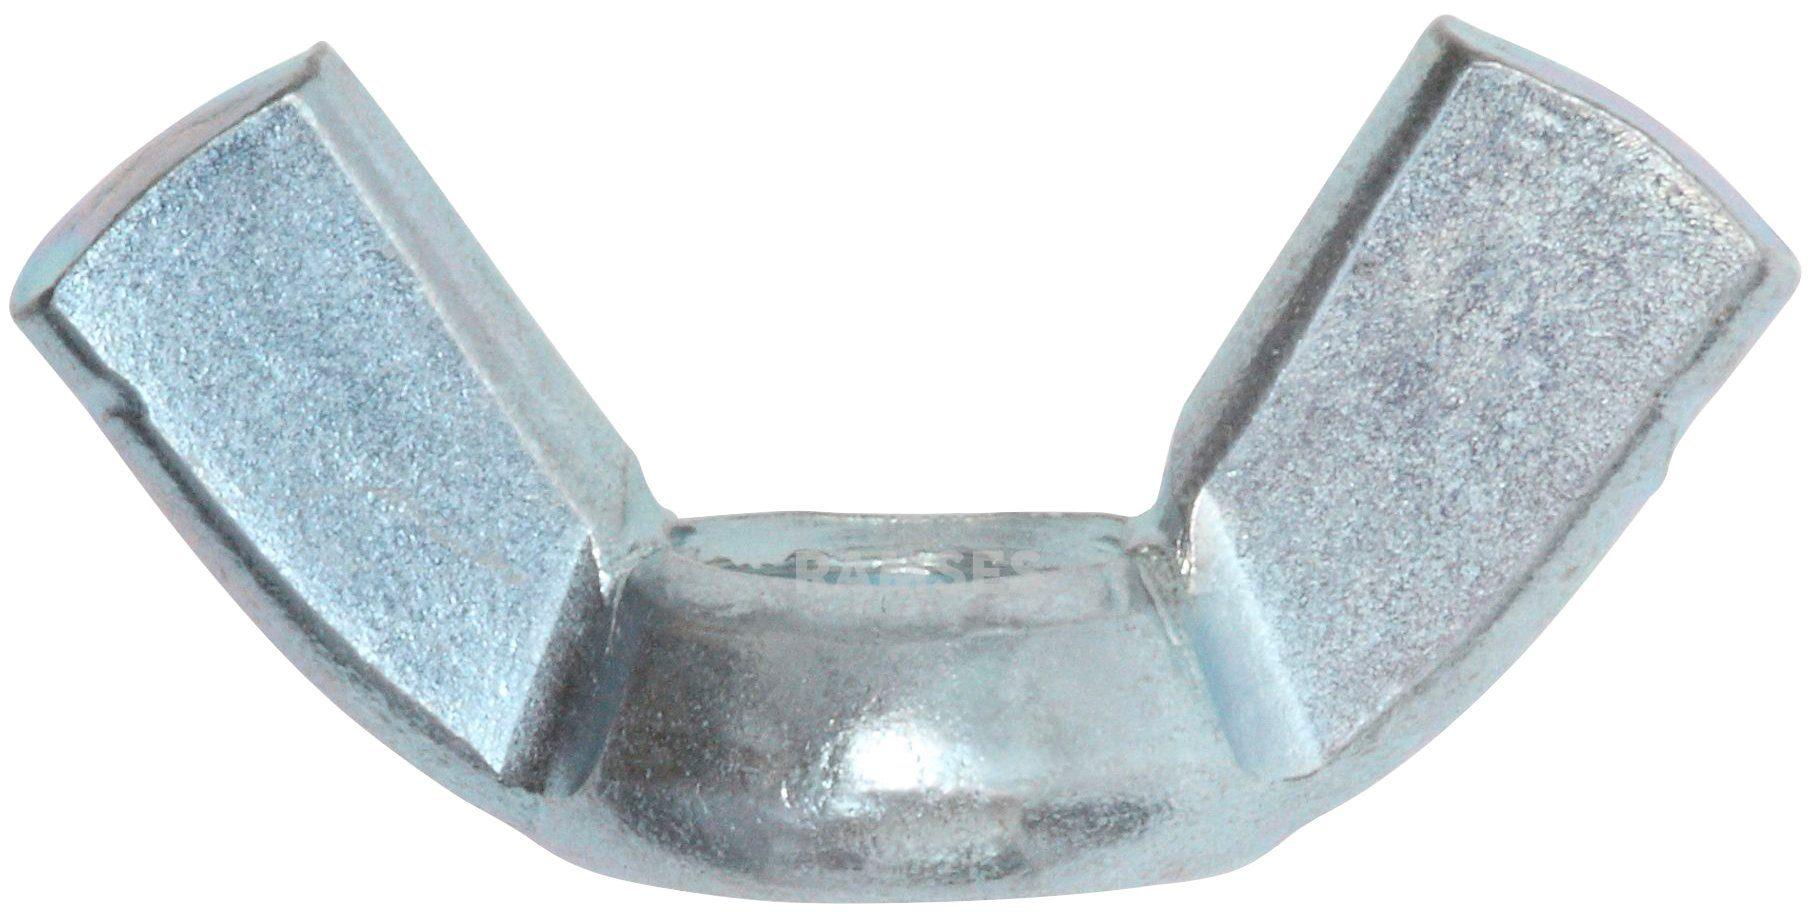 RAMSES Flügelmutter , DIN 315 Amerikanische Form M8, 100 Stück